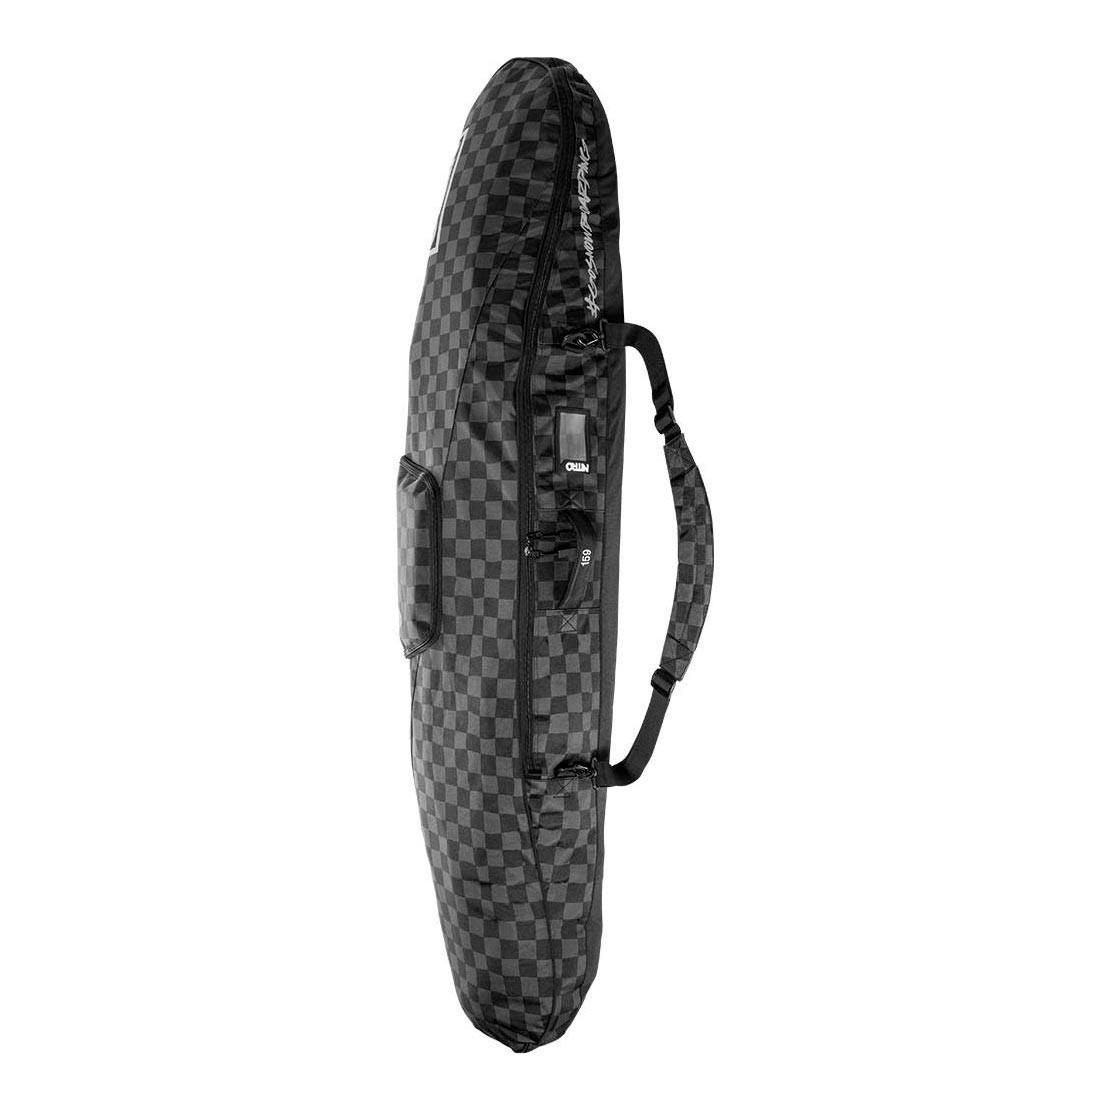 Obal na snowboard Nitro Sub Board Bag checker vel.159 16/17 + doručení do 24 hodin